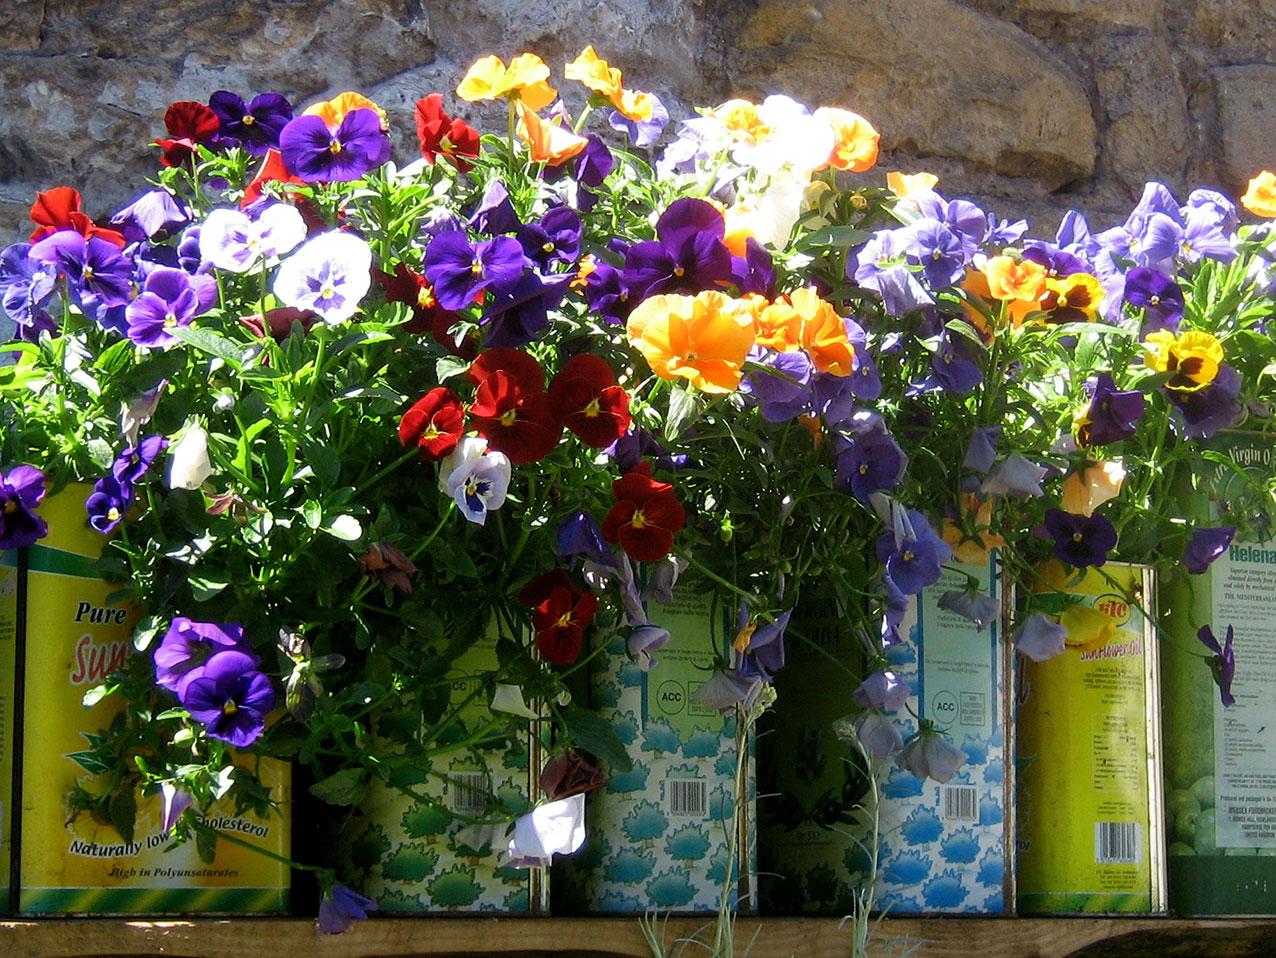 flower-garden-bar-restaurant-somerset.jpg